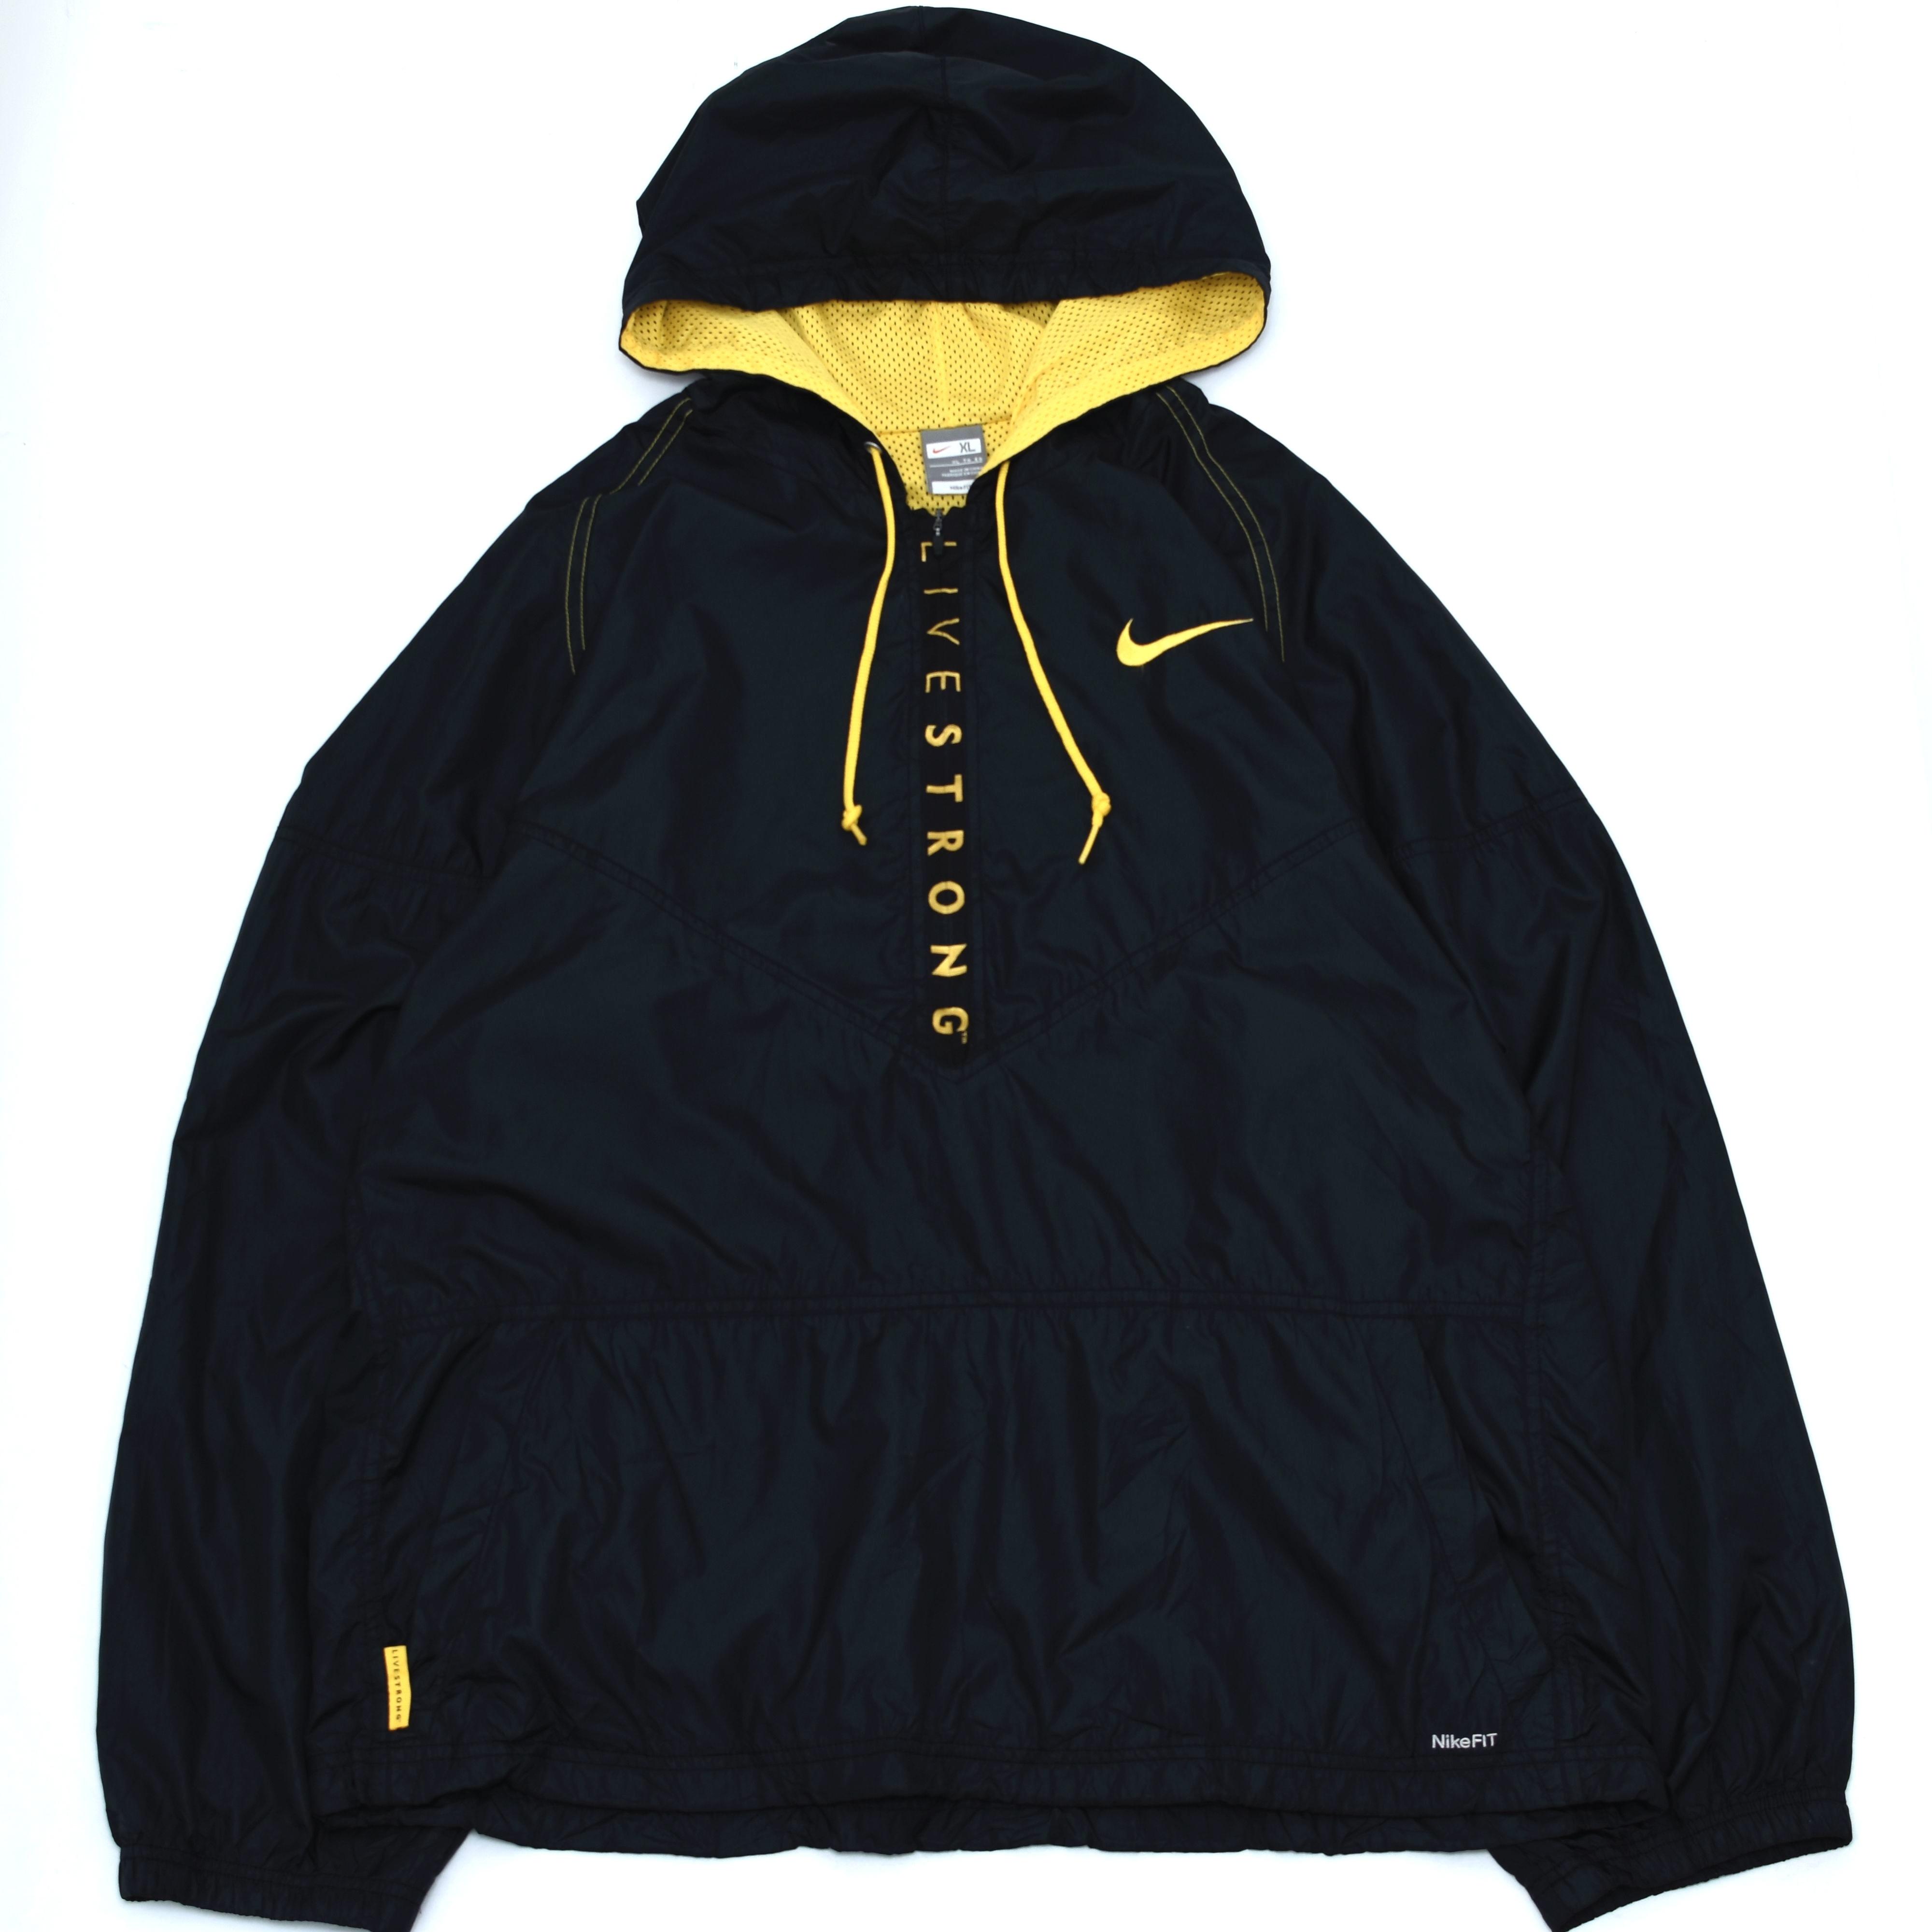 NIKE LIVESTRONG half zip nylon jacket